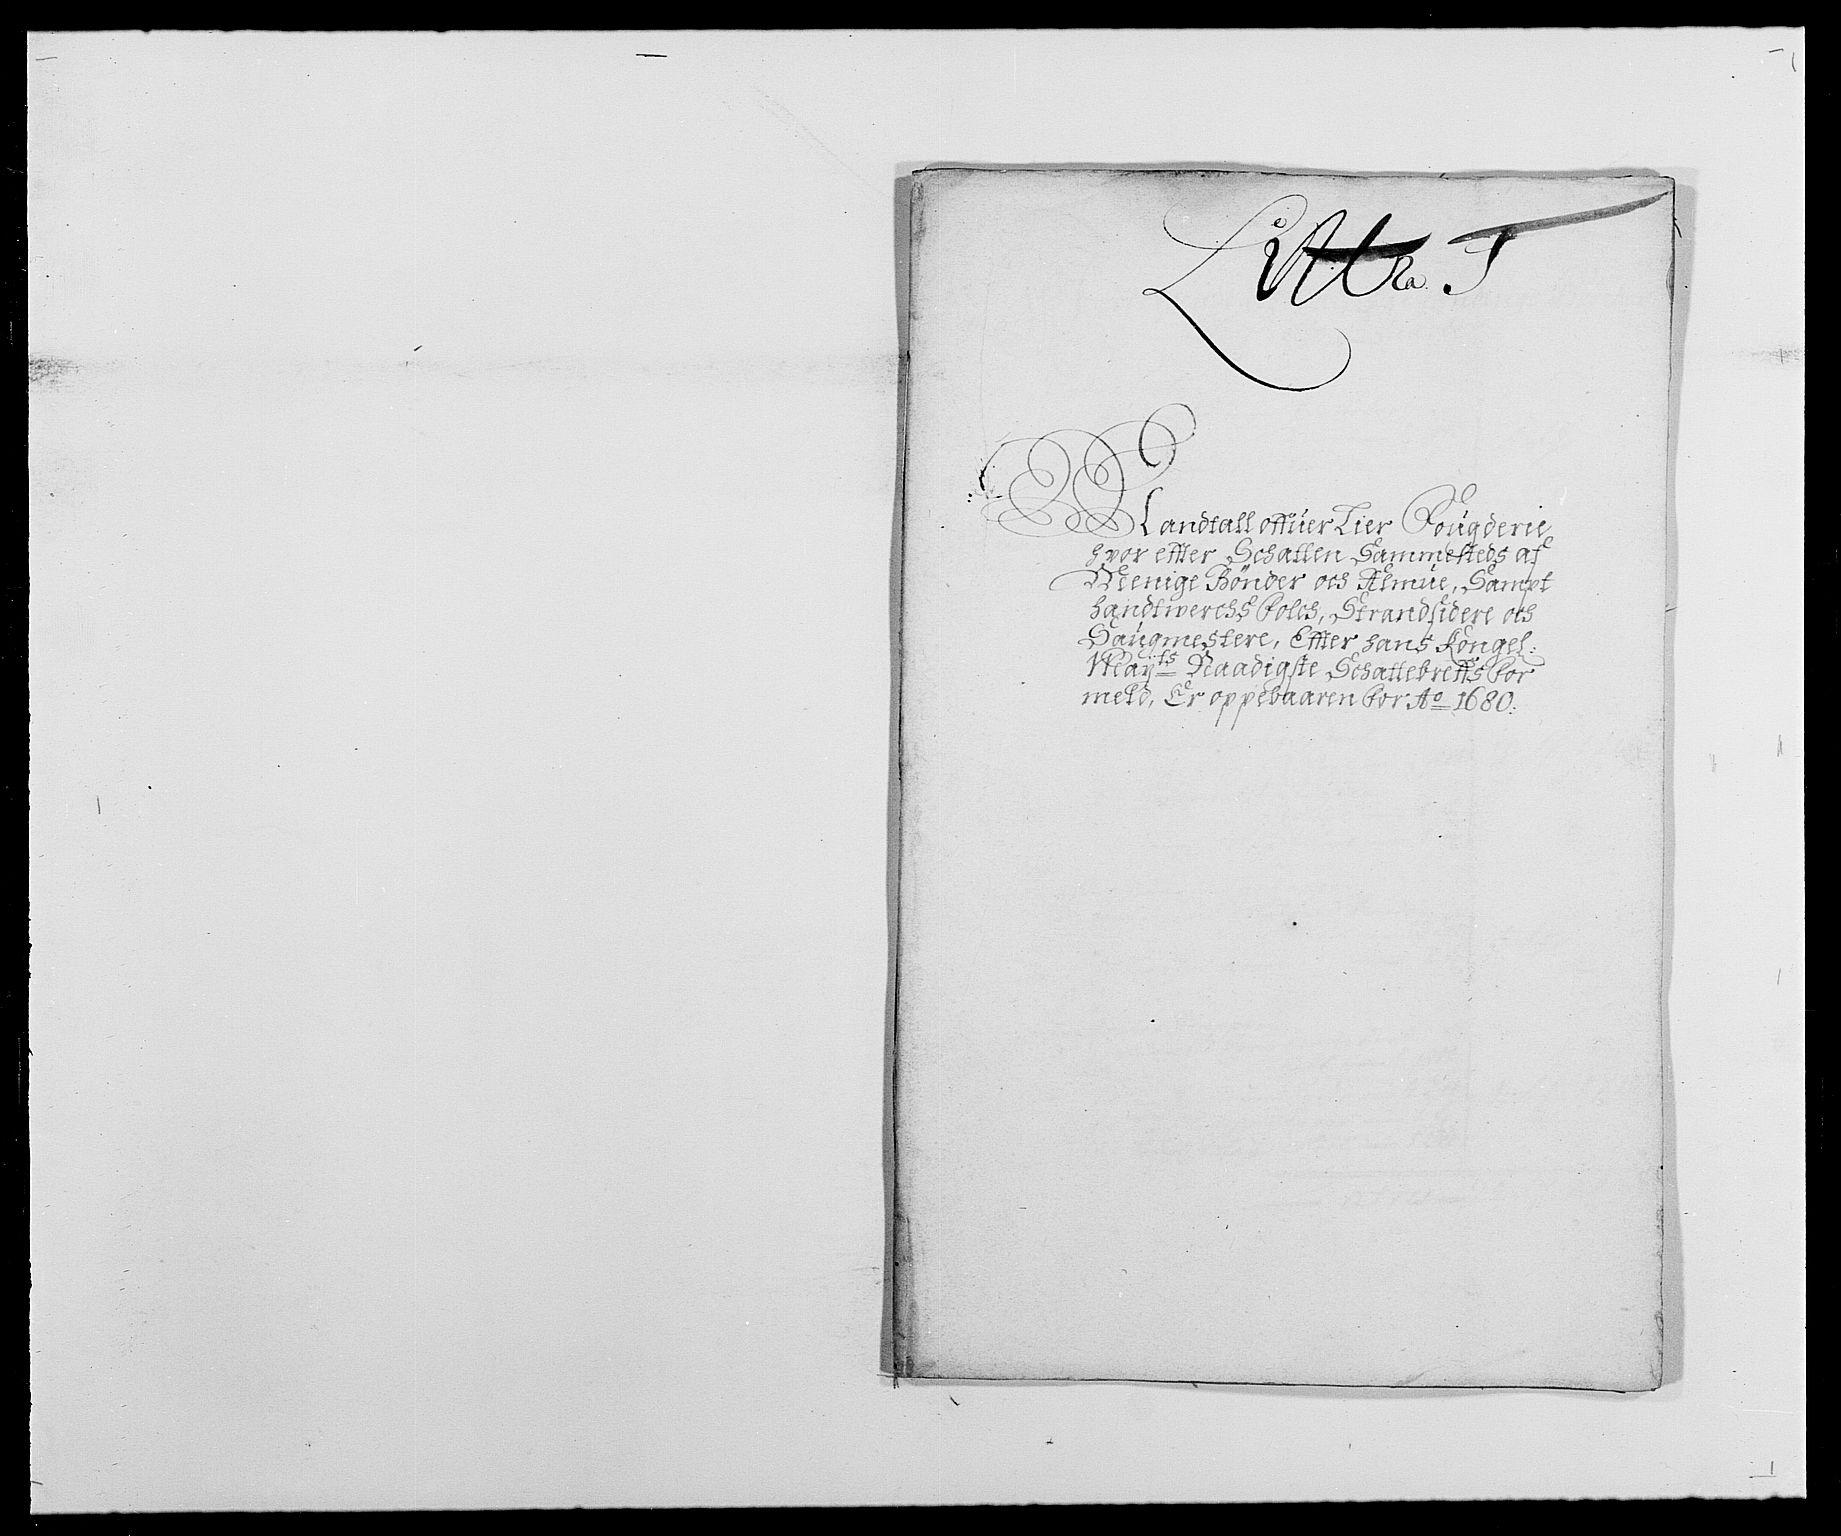 RA, Rentekammeret inntil 1814, Reviderte regnskaper, Fogderegnskap, R27/L1686: Fogderegnskap Lier, 1678-1686, s. 235